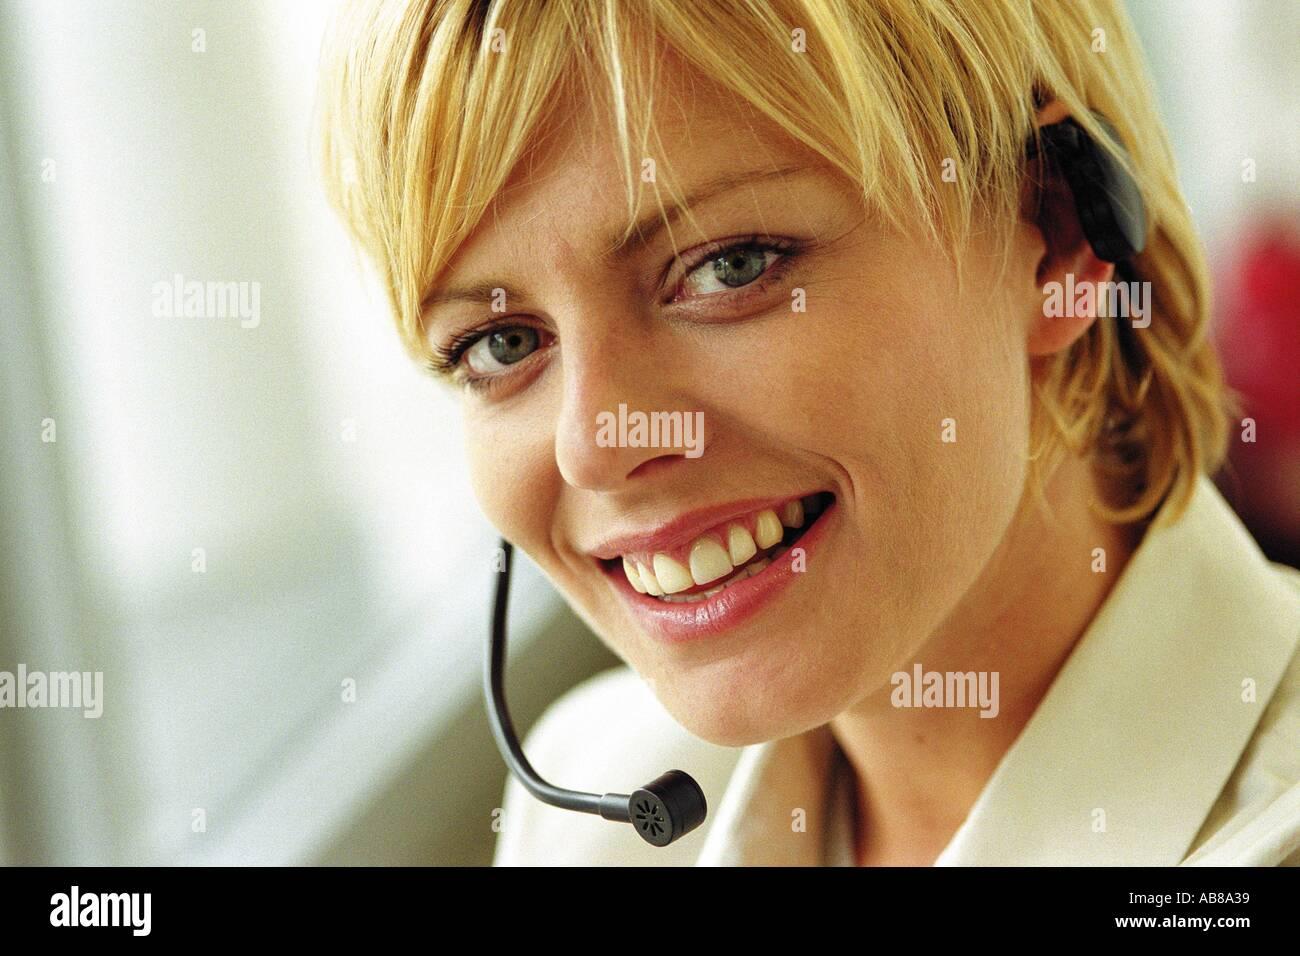 Woman wearing a telephon headset - Stock Image